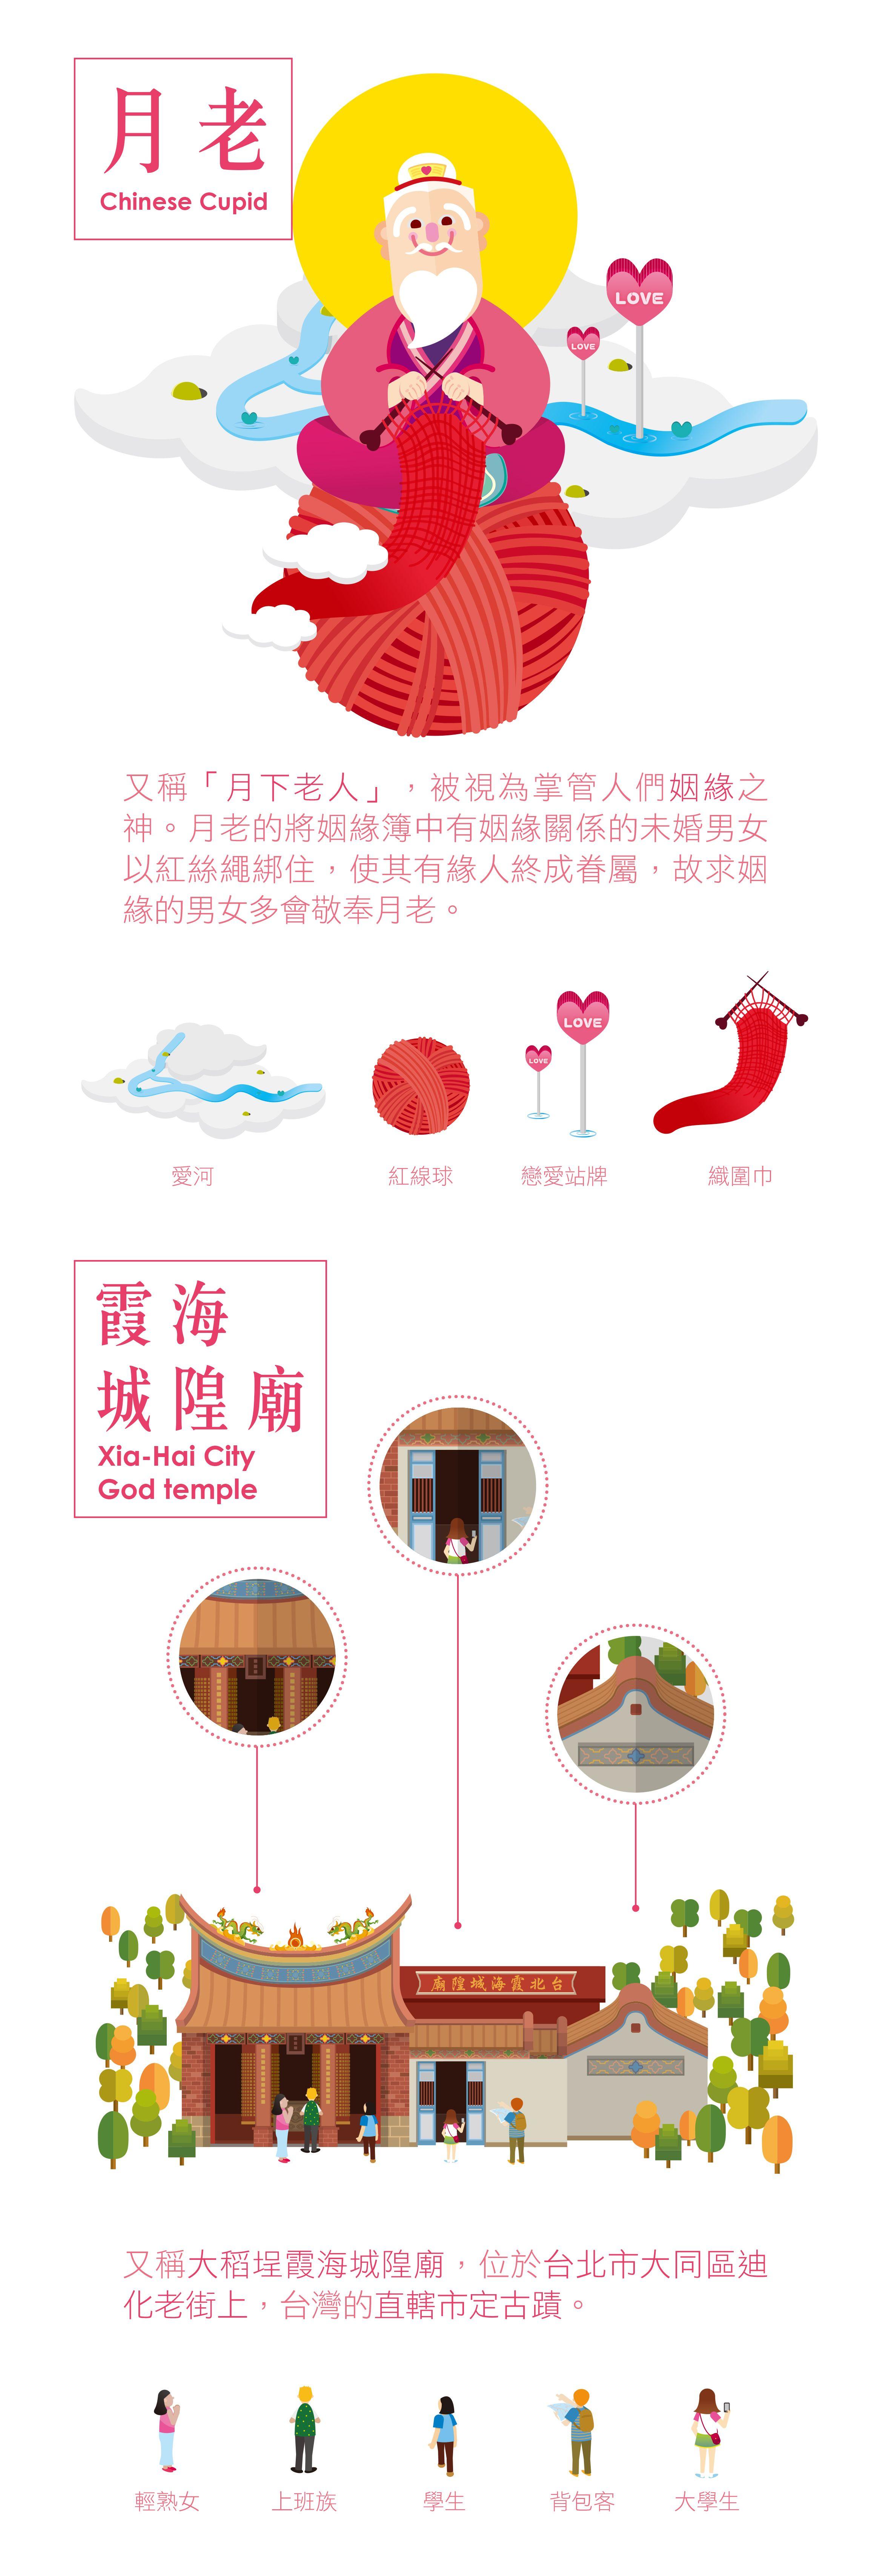 Taiwan love cupid